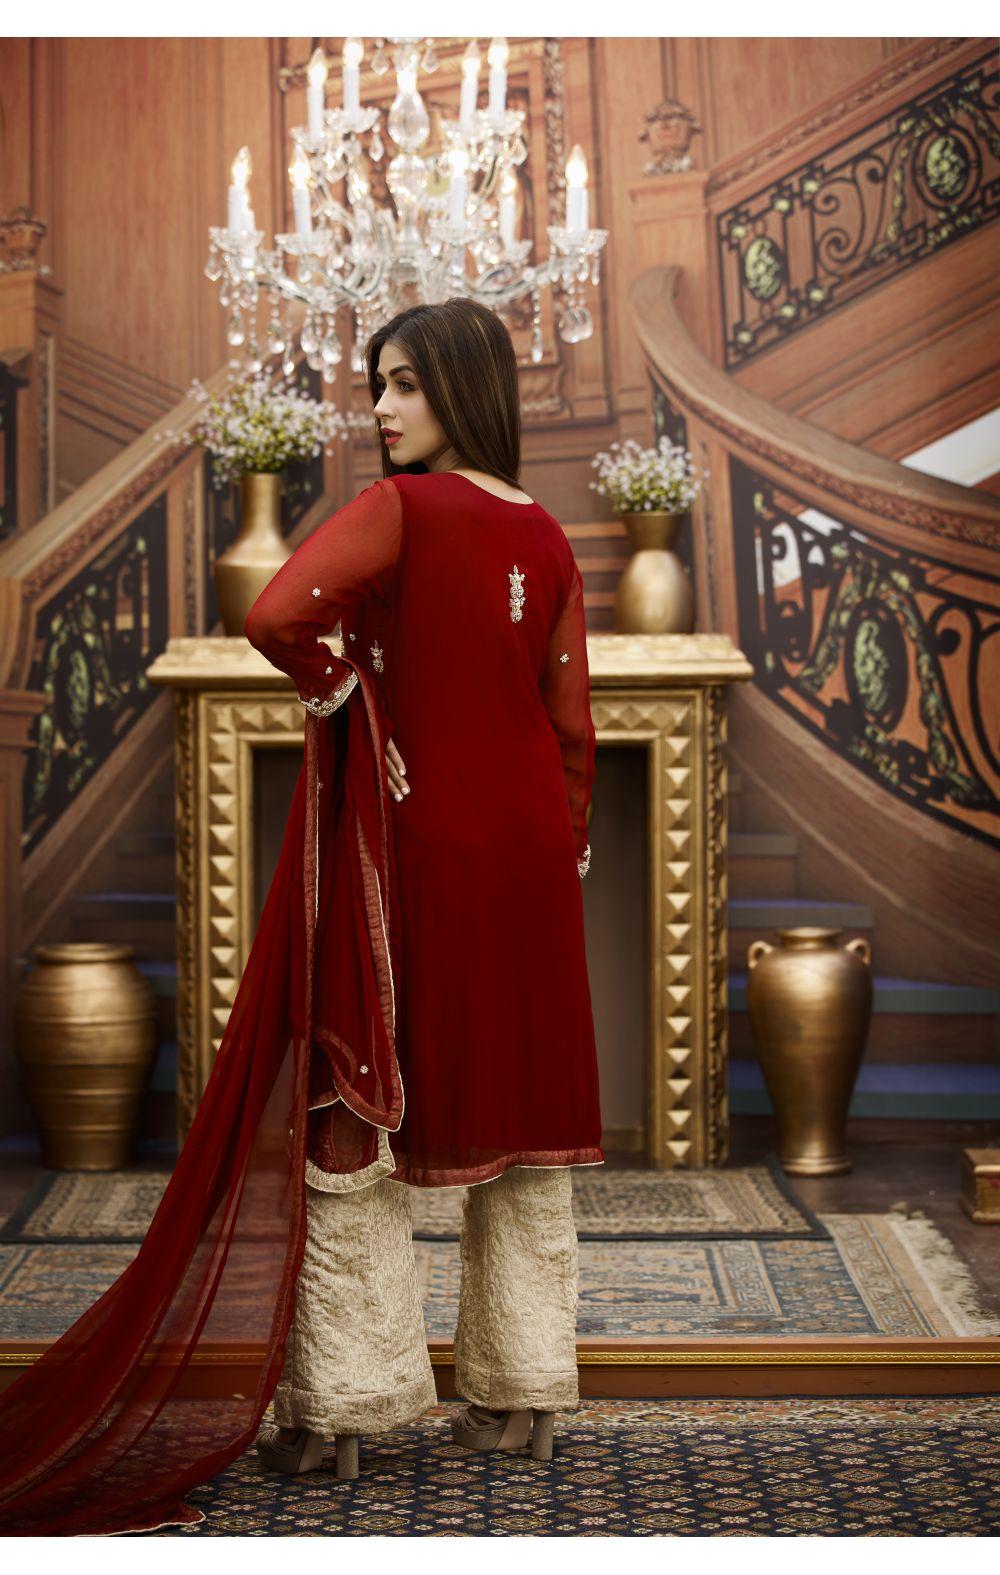 Buy Exclusive Maroon And Golden Bridal Wear – G16464 Online In USA, Uk & Pakistan - 03